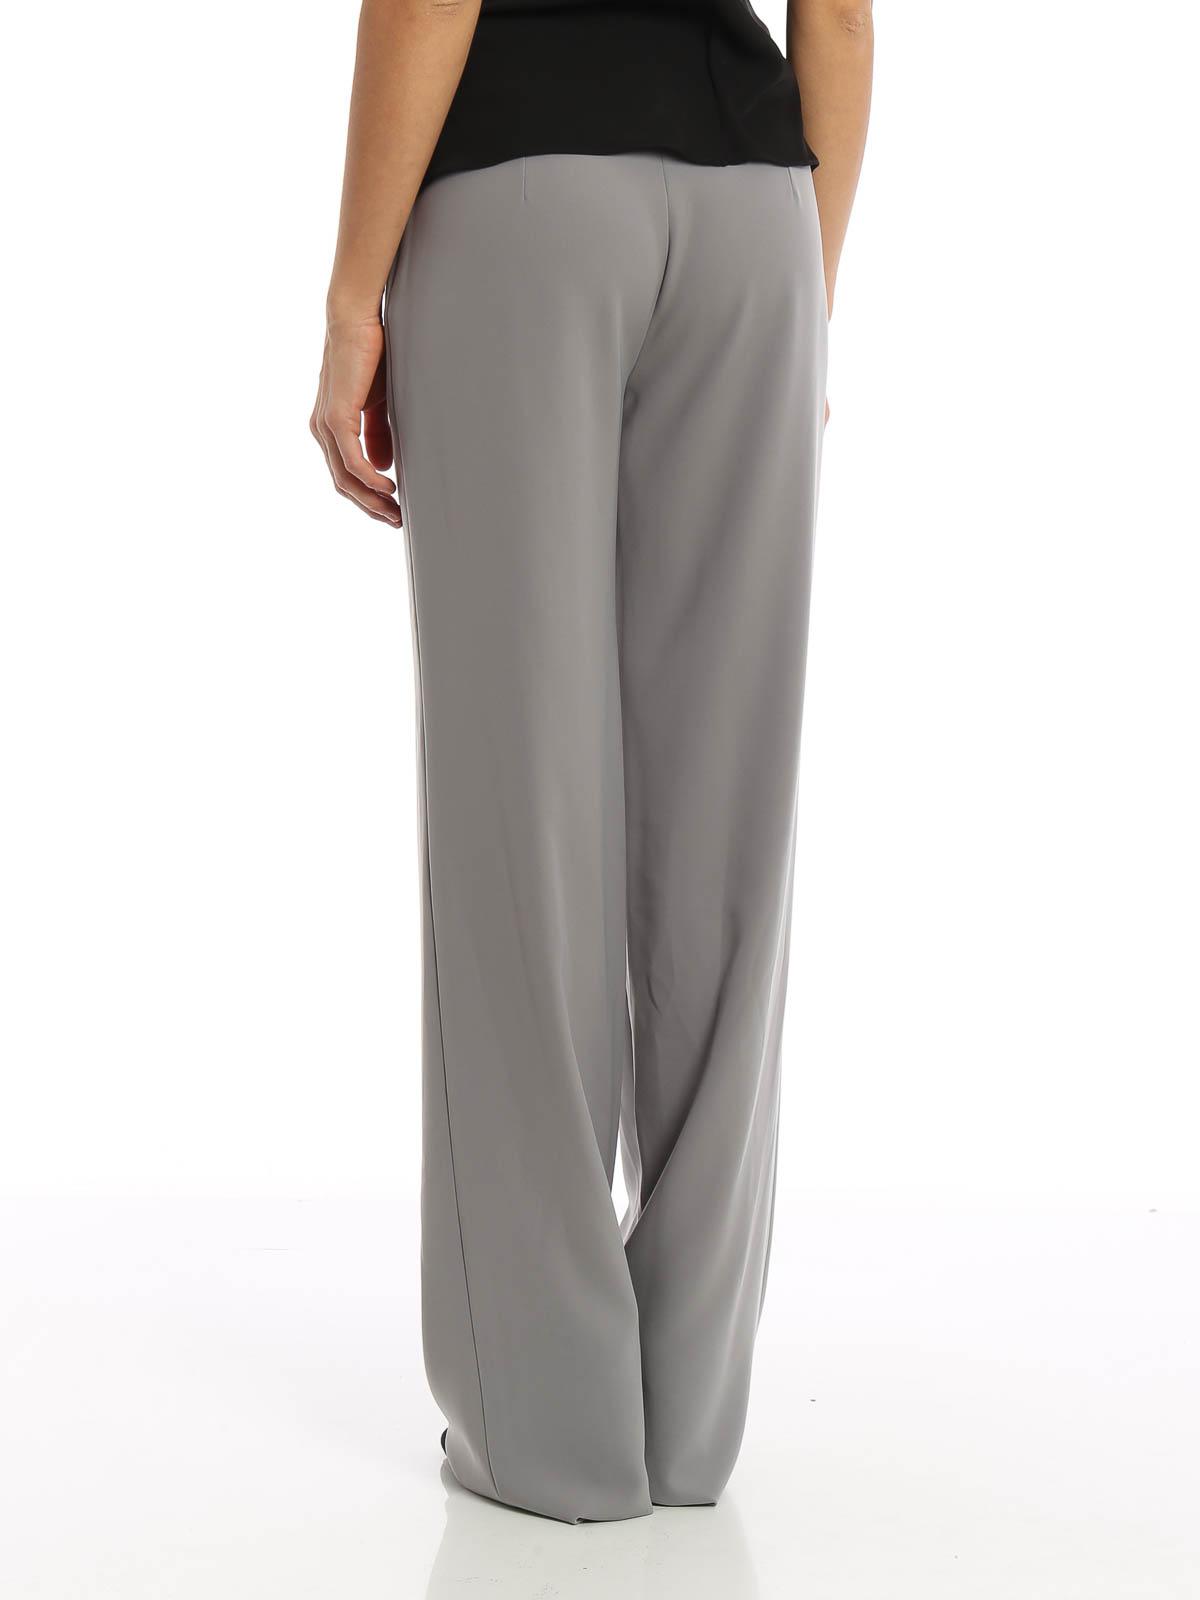 5f842075f Armani Collezioni - Pantalón De Vestir Gris Para Mujer - Pantalones ...